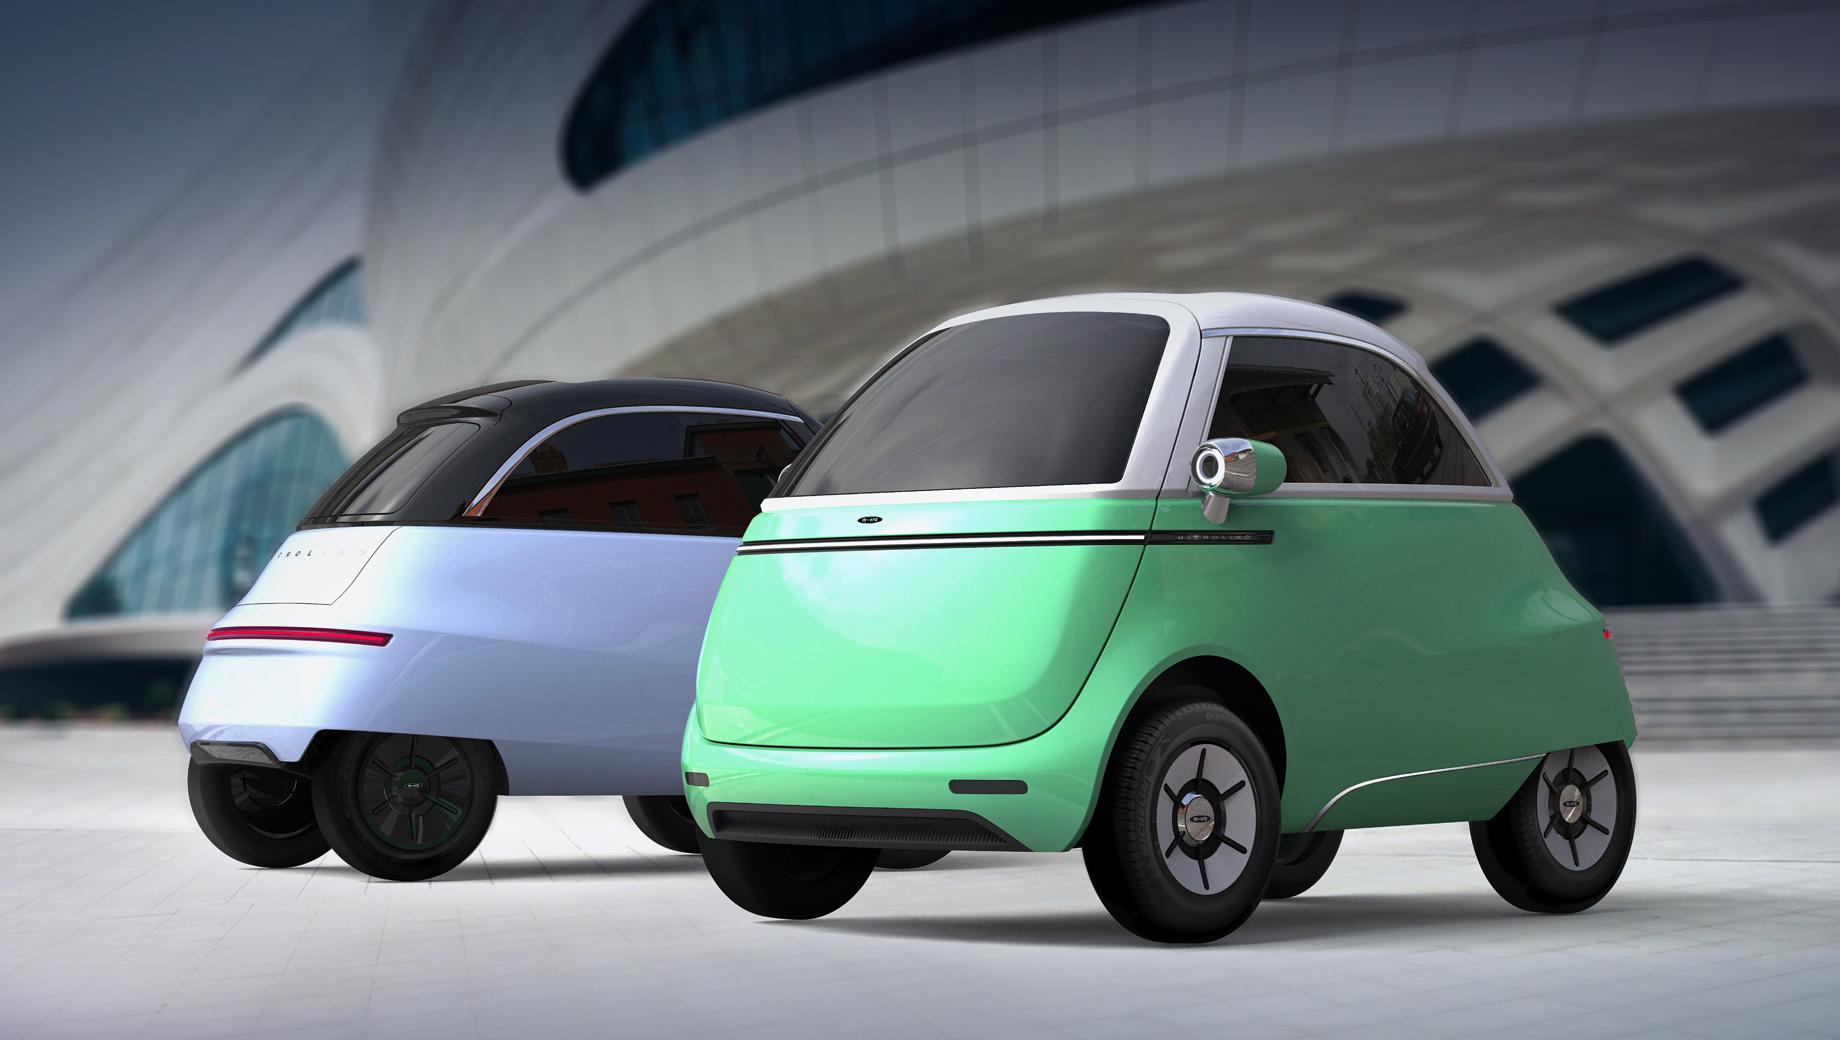 Сити-кар Microlino преобразится в версии 2.0 microlino,Марки и модели,Новые модели